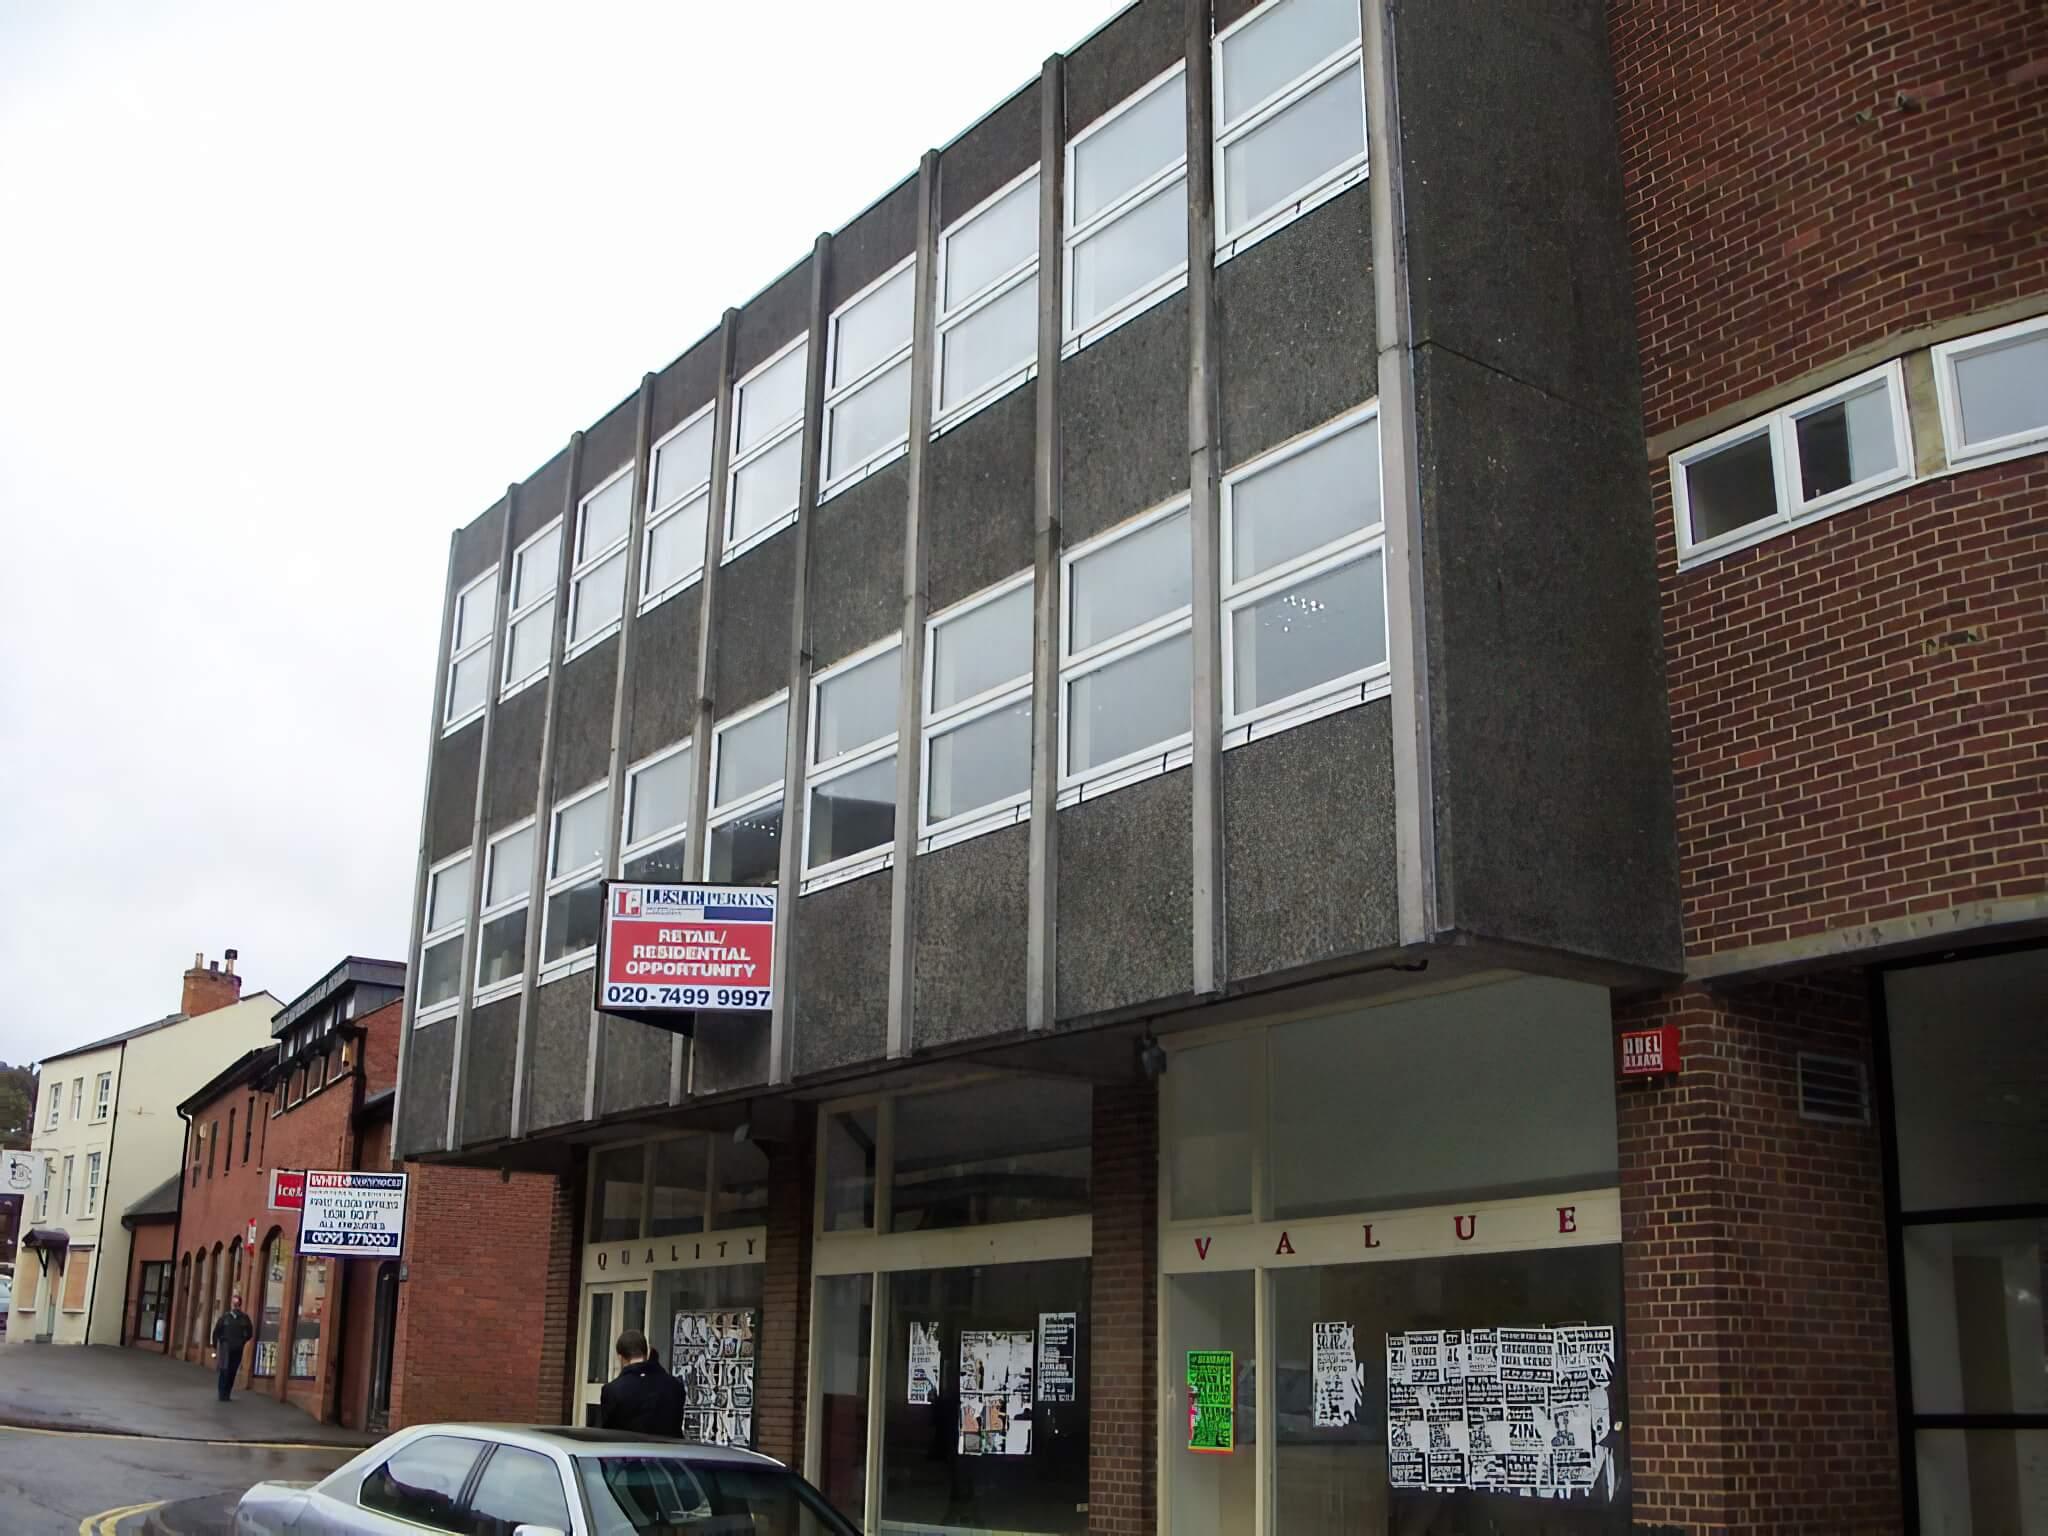 Calthorpe Street, Banbury